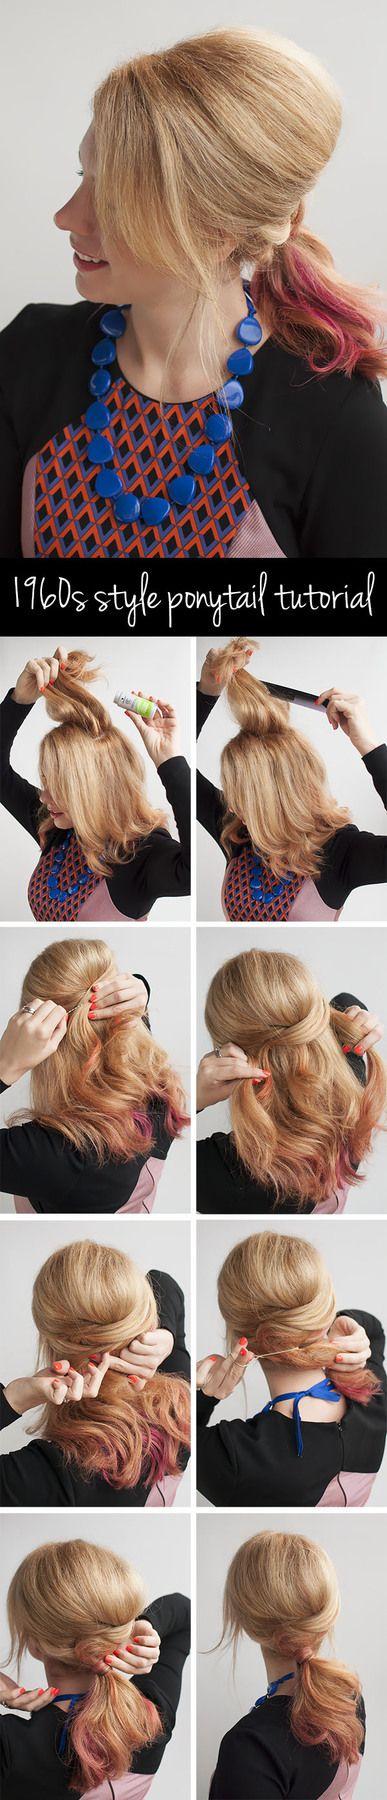 1960s style ponytail hair tutorial   Hair Romance